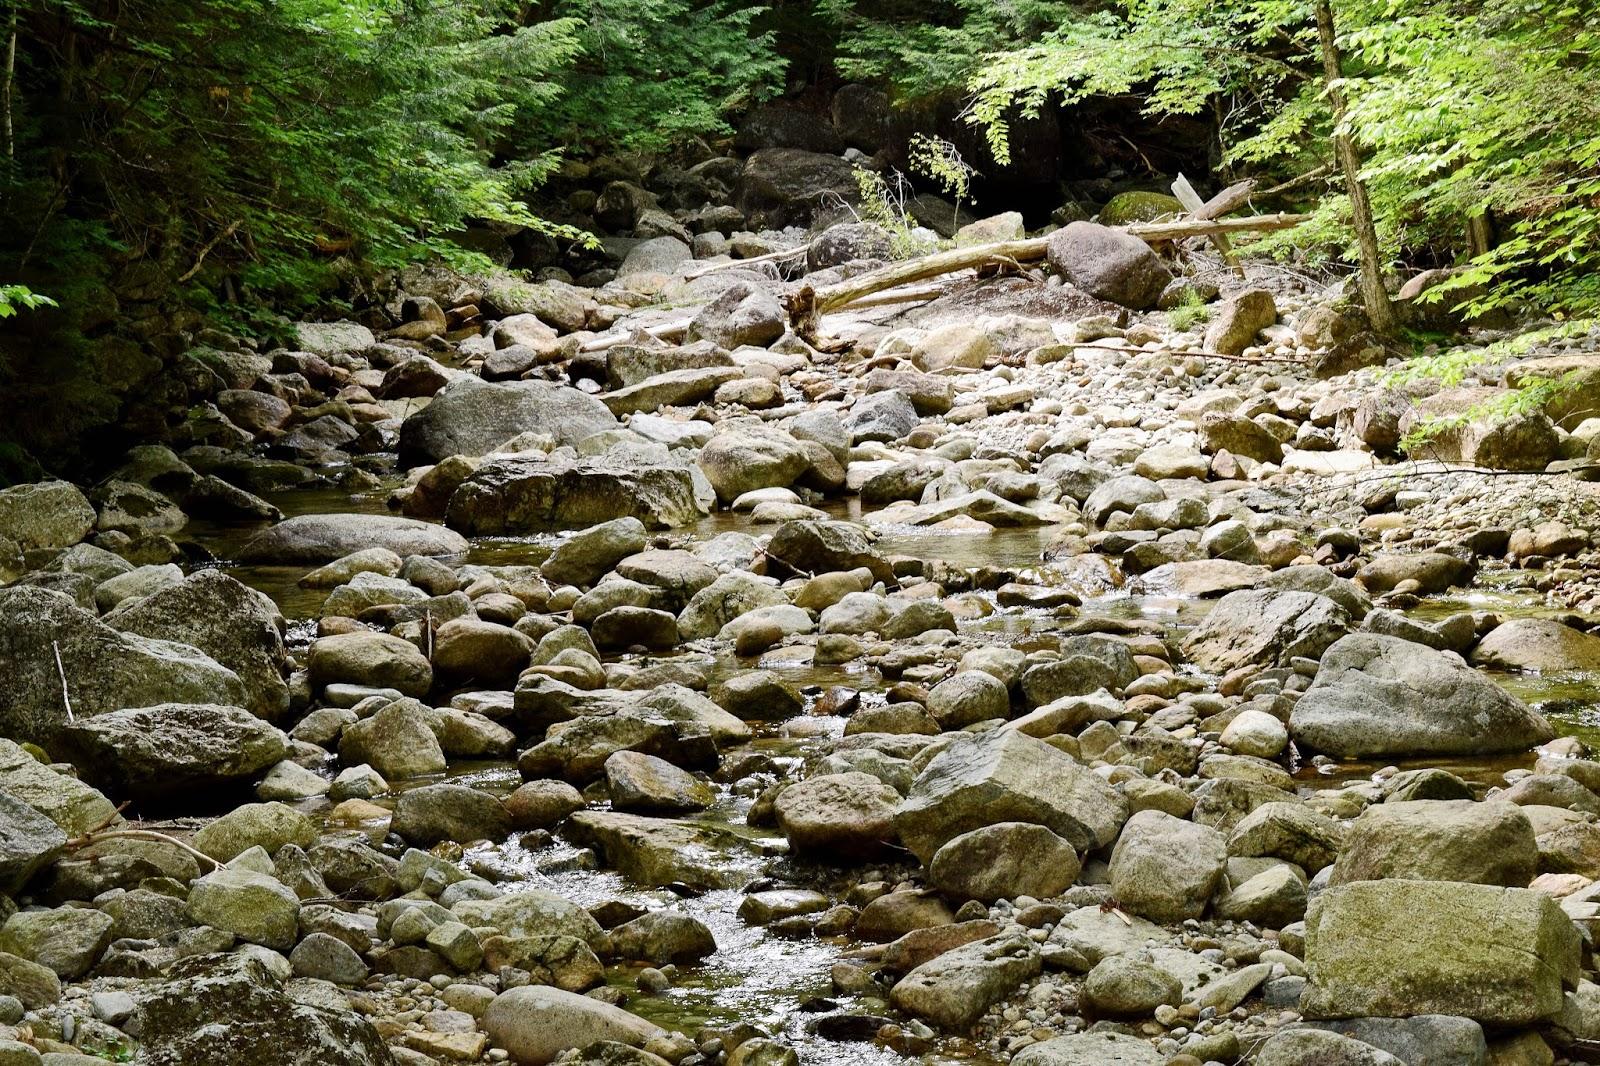 Timothy J Robinson: Gothic Peak hike